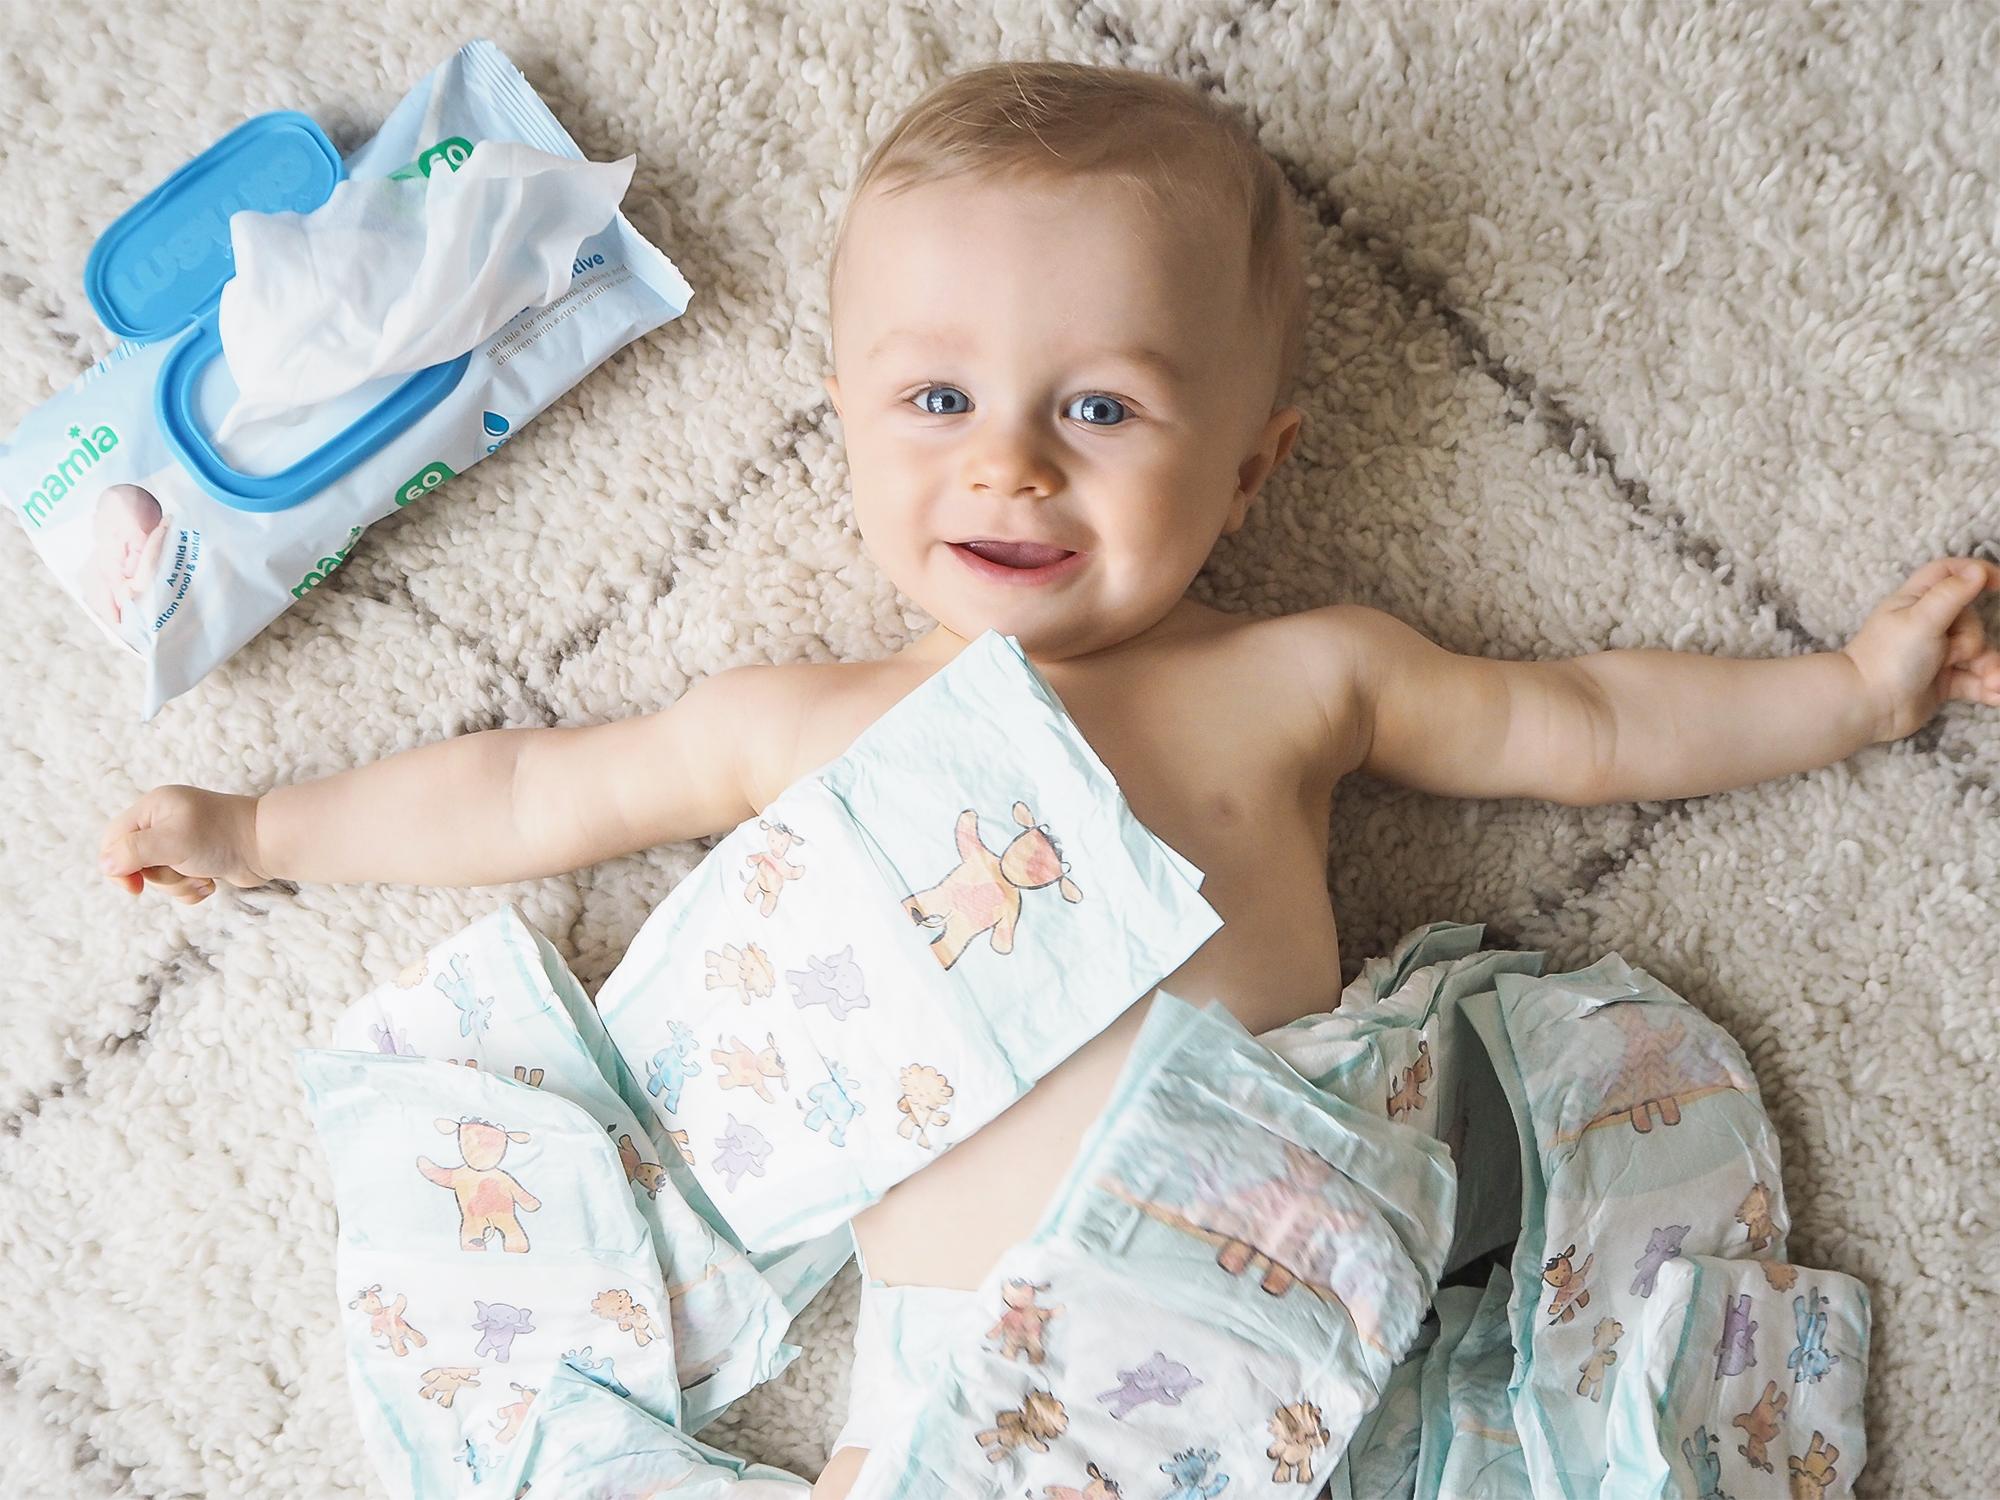 Aldi Mamia Nappies & Baby Wipes